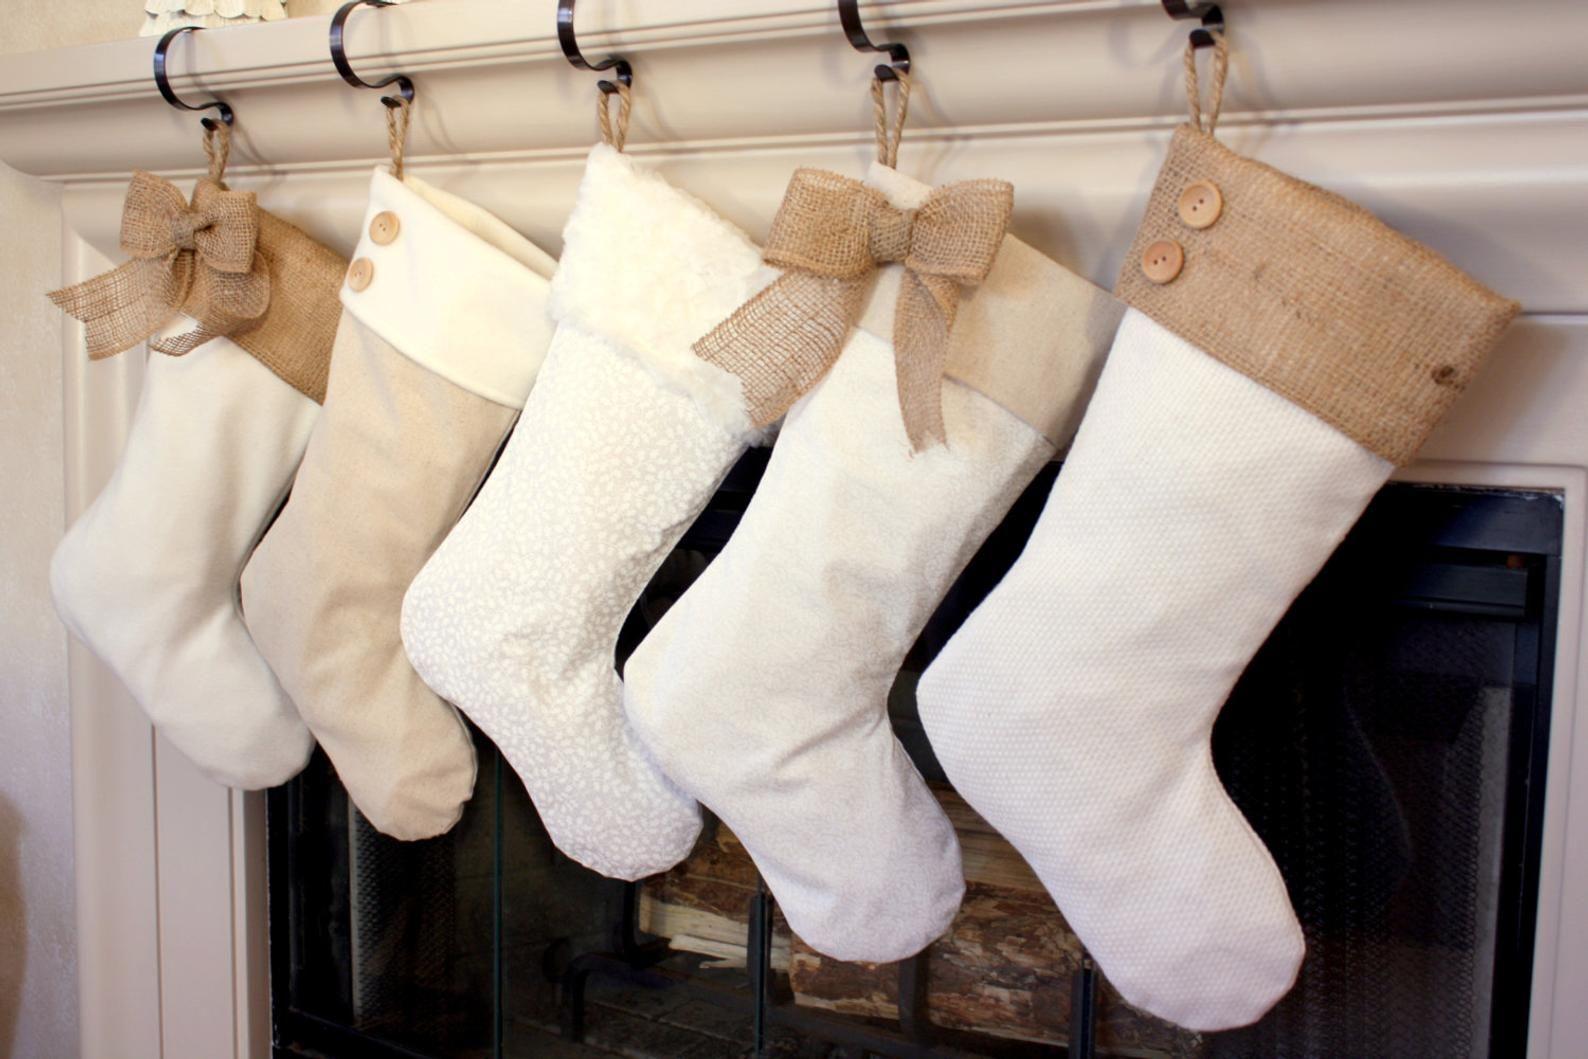 Christmas Burlap Stockings CHOOSE TWO 2 The Classic Cream Line-  Burlap Stockings